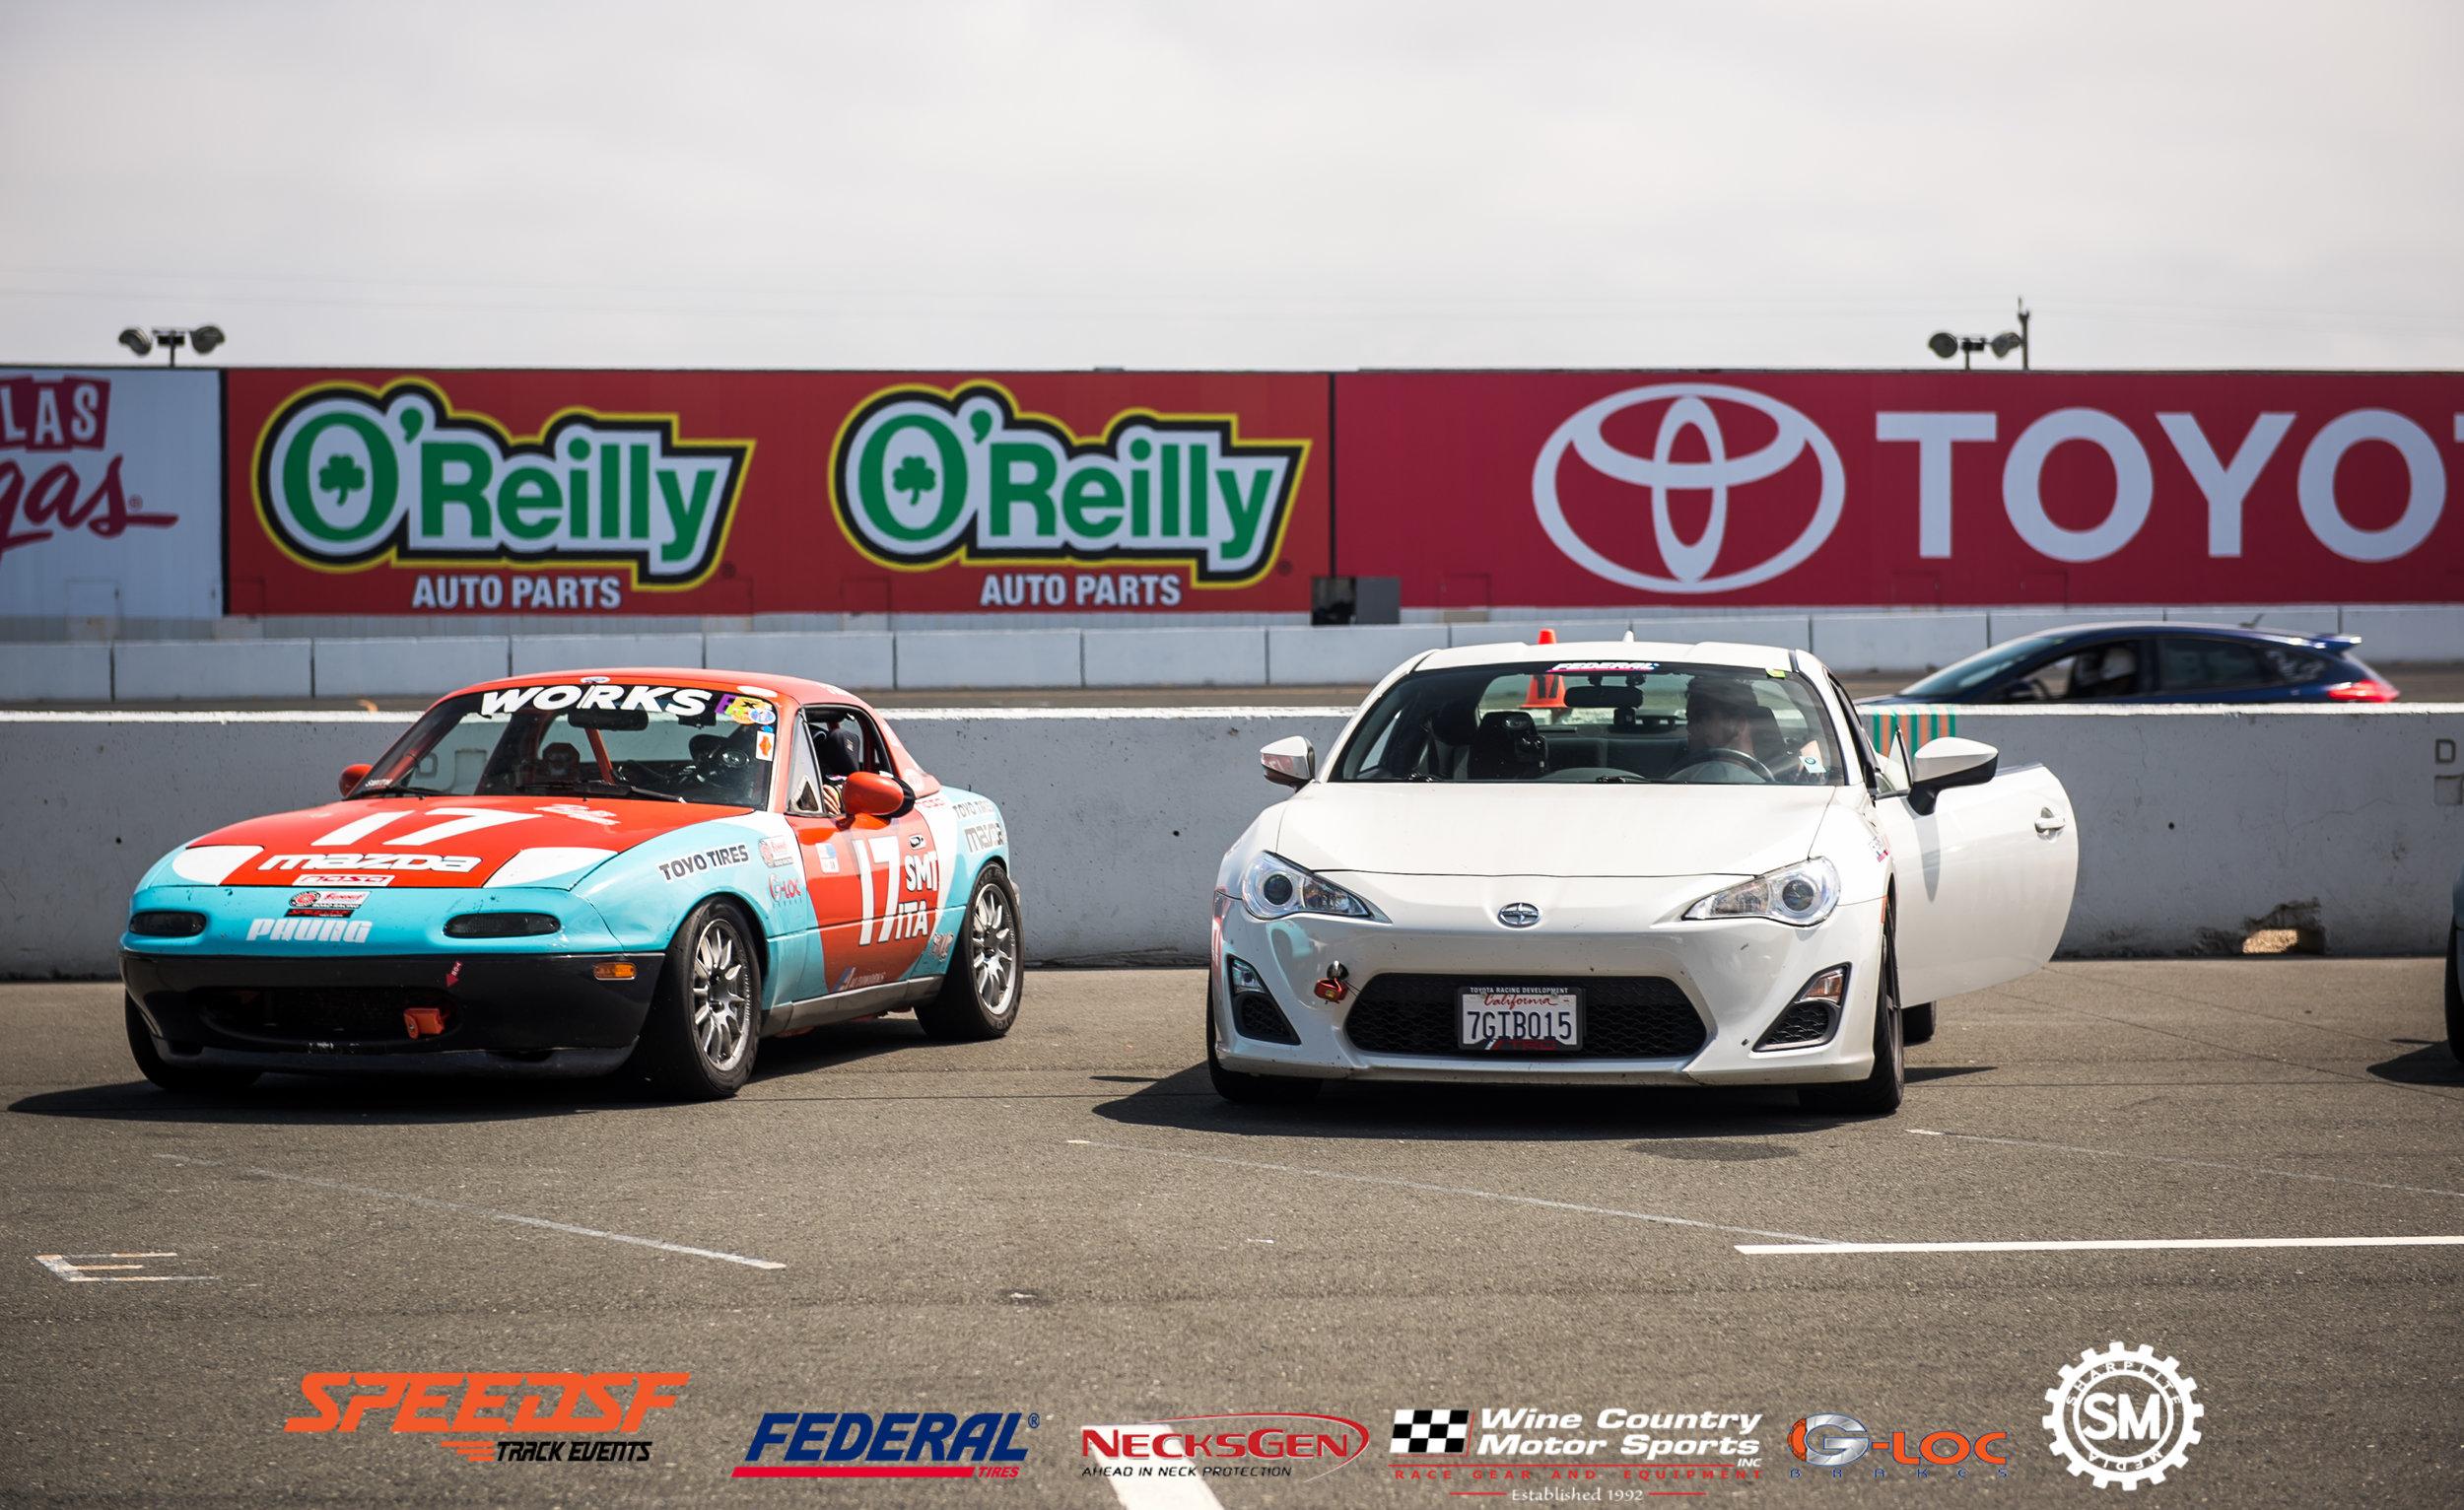 Sonoma Raceway_Monday_SpeedSF_PADDOCK-21.jpg